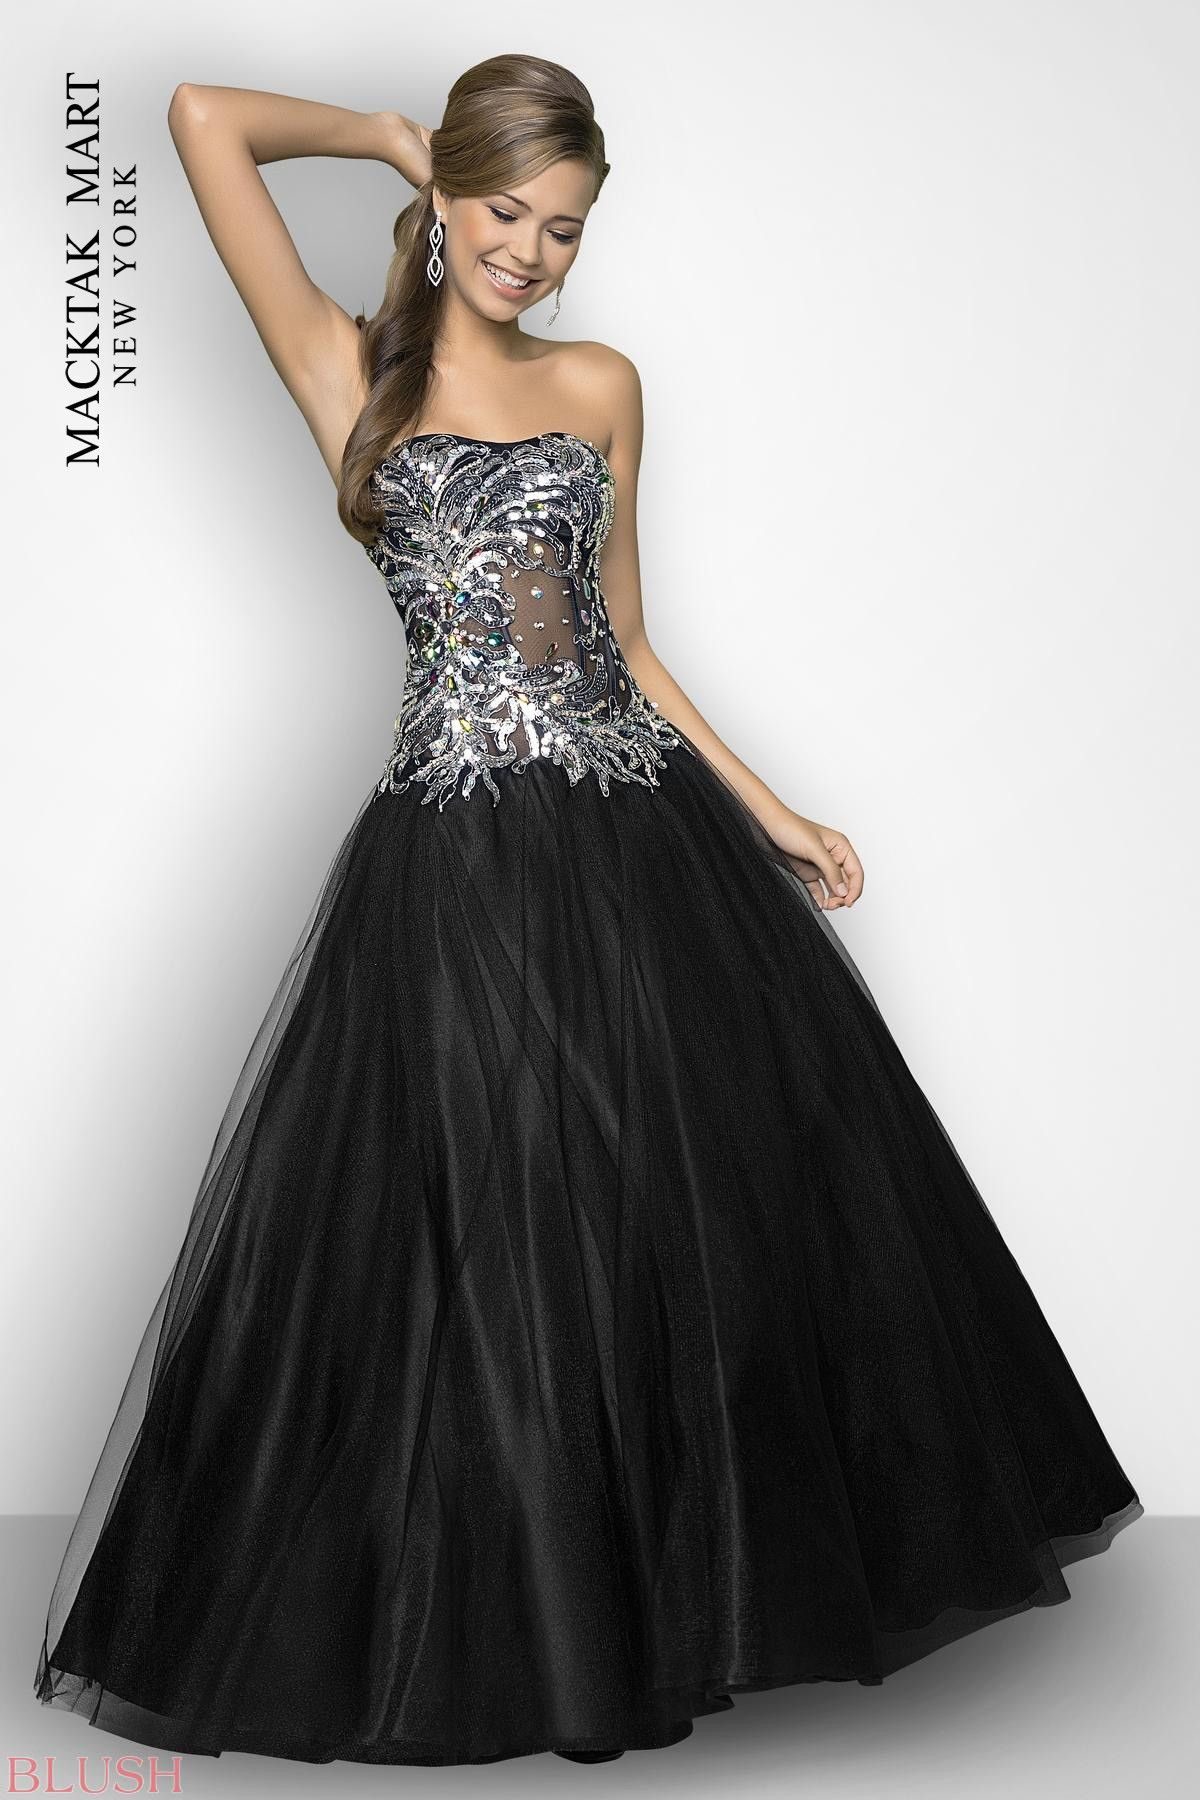 Blush dress now noches estelares